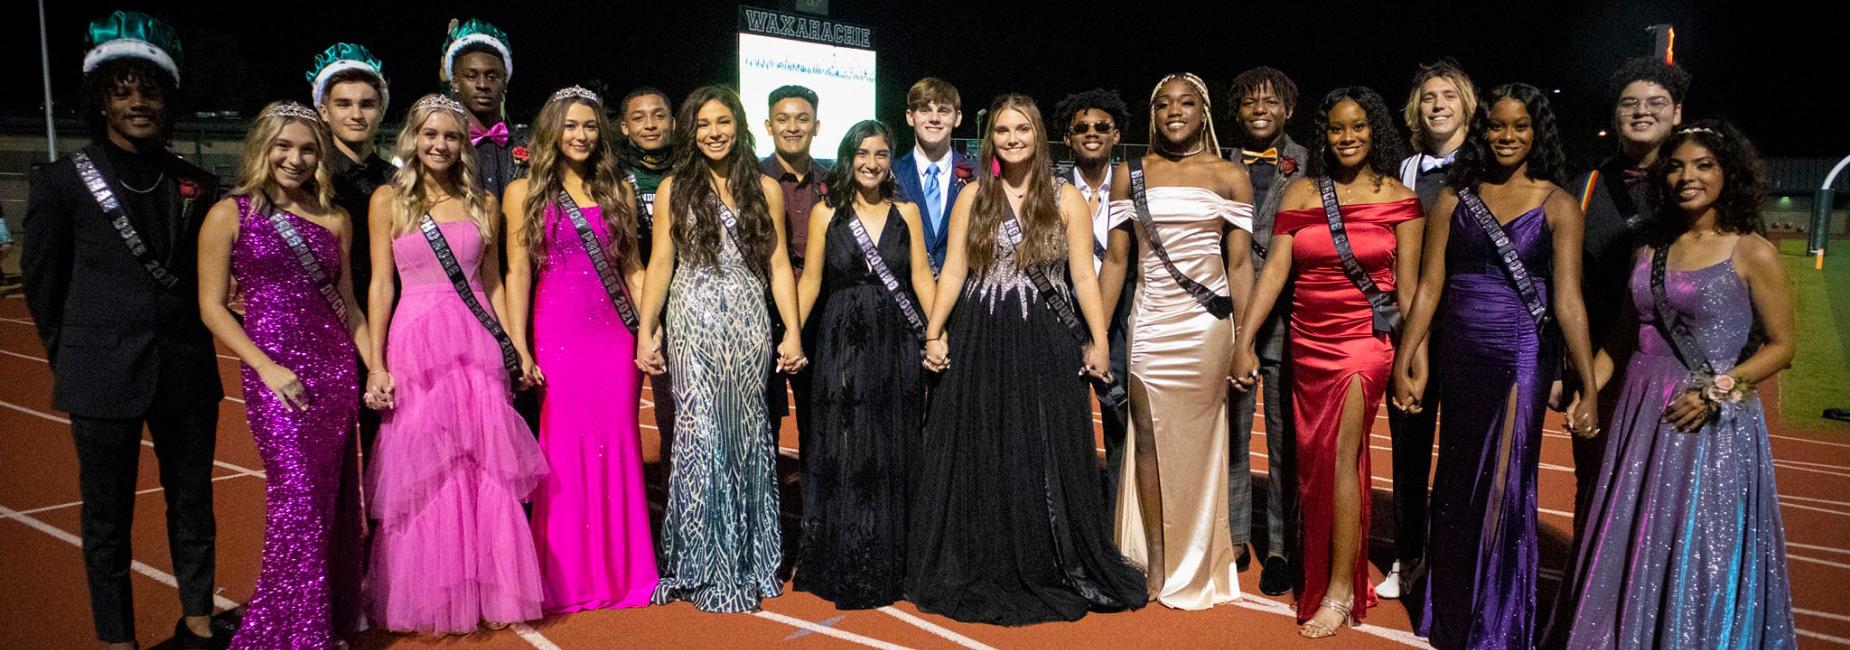 group of teens in formal wear on sidelines of football field